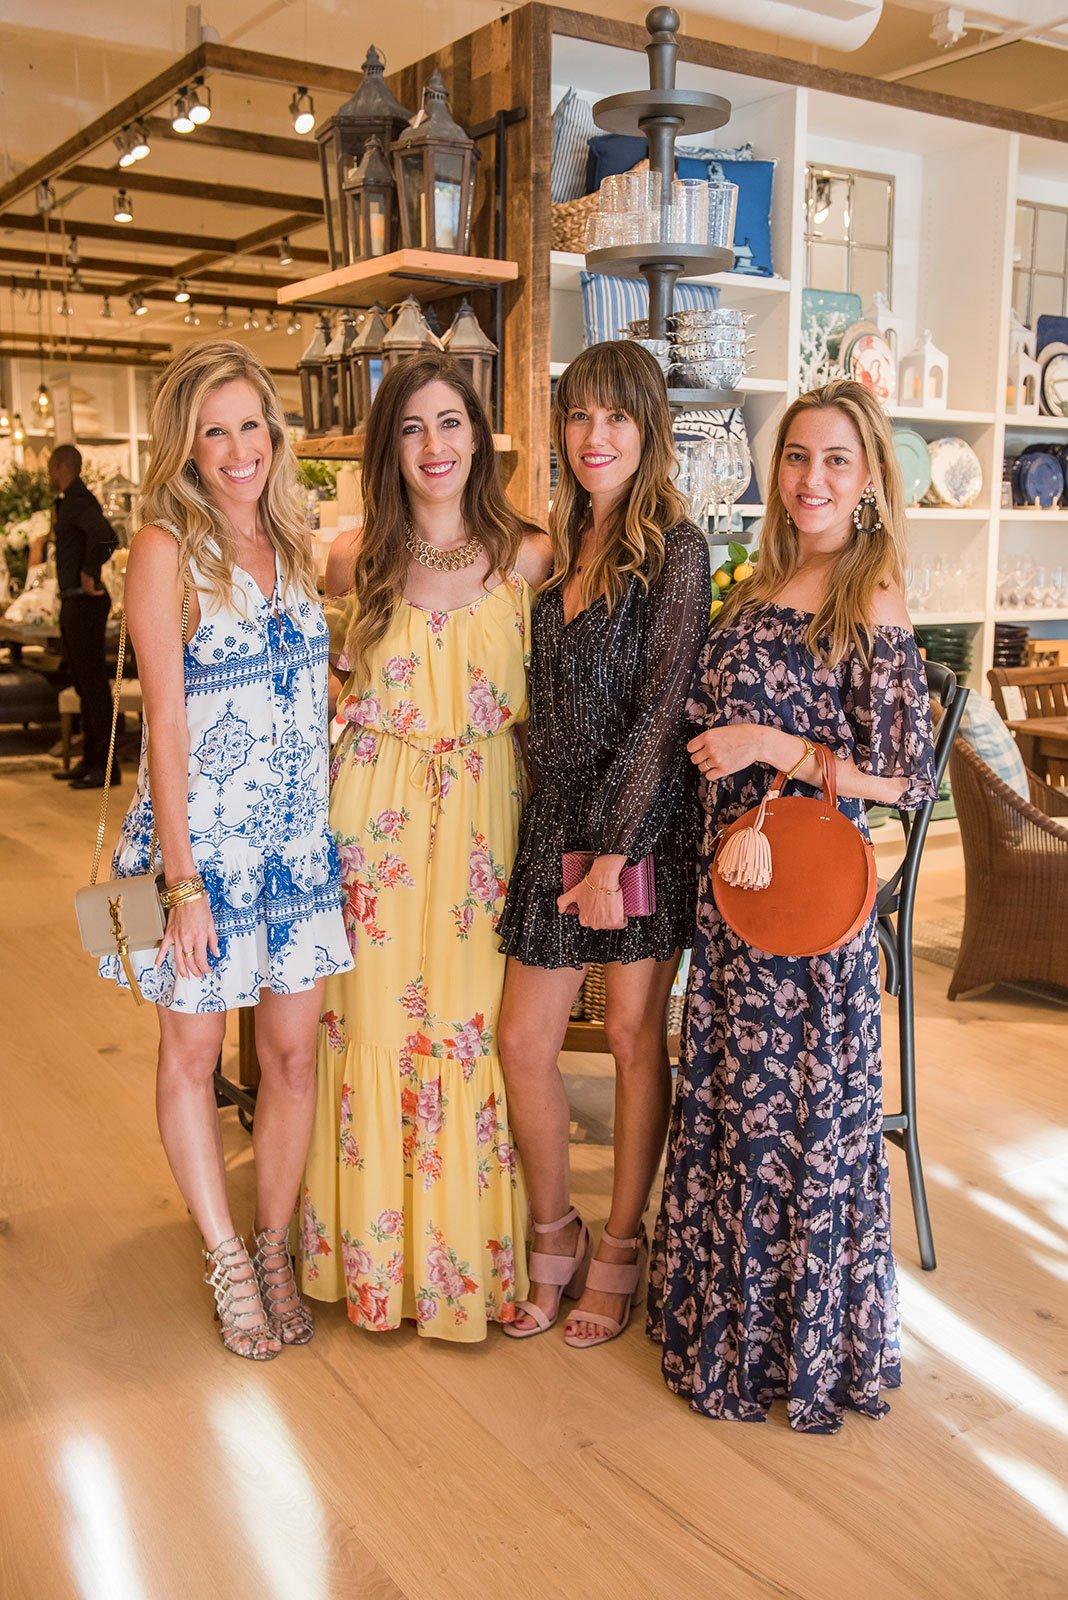 Pottery Barn South Beach Grand Opening co-hosts Amanda Gluck, Katya Libim, Ana Linares and Amri Kibbler